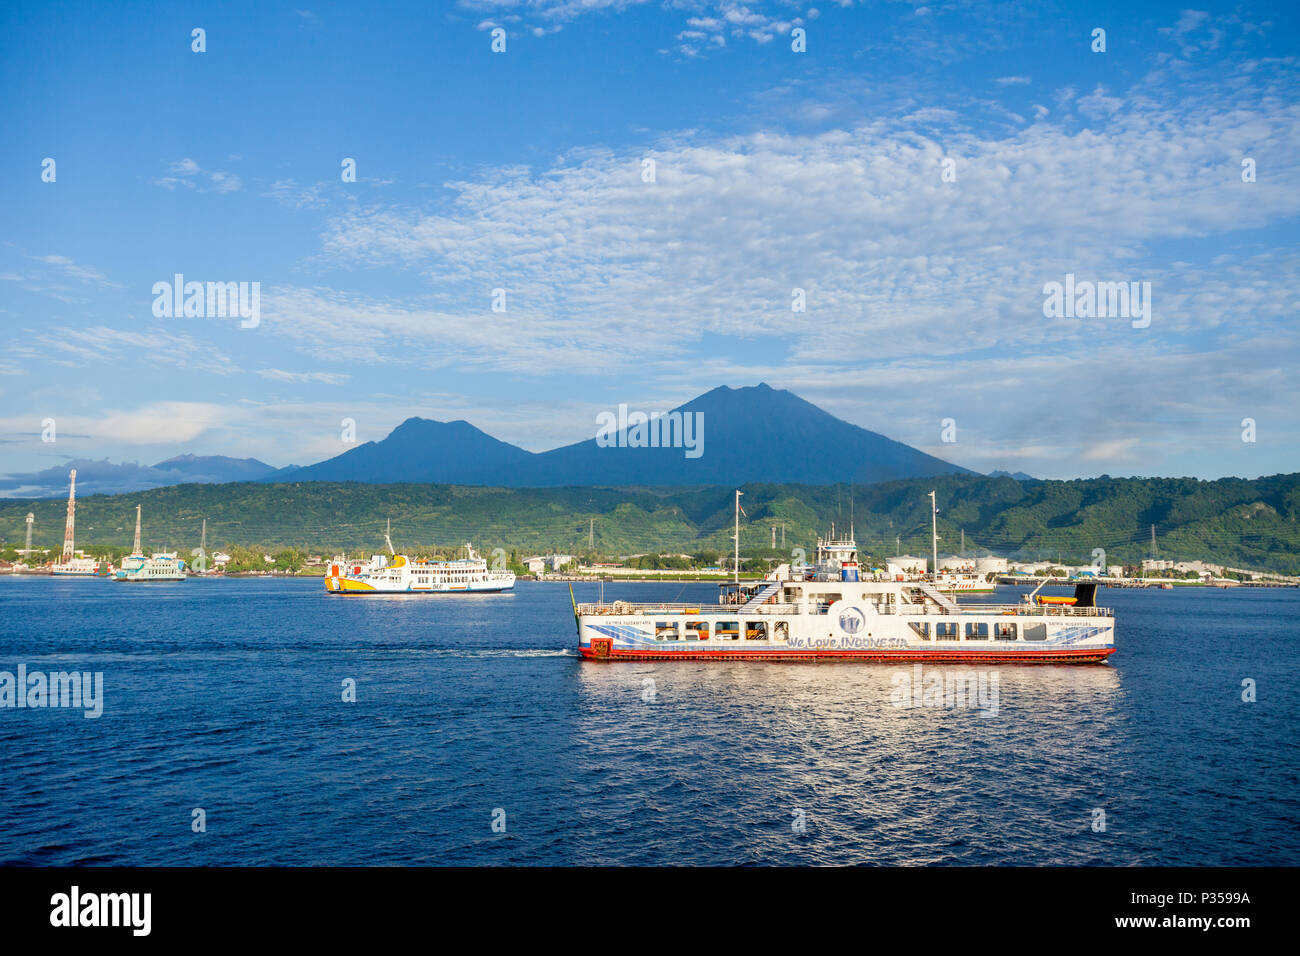 The Ijen, Raung, Kukusan volcanoes on Java, Indonesia - Stock Image